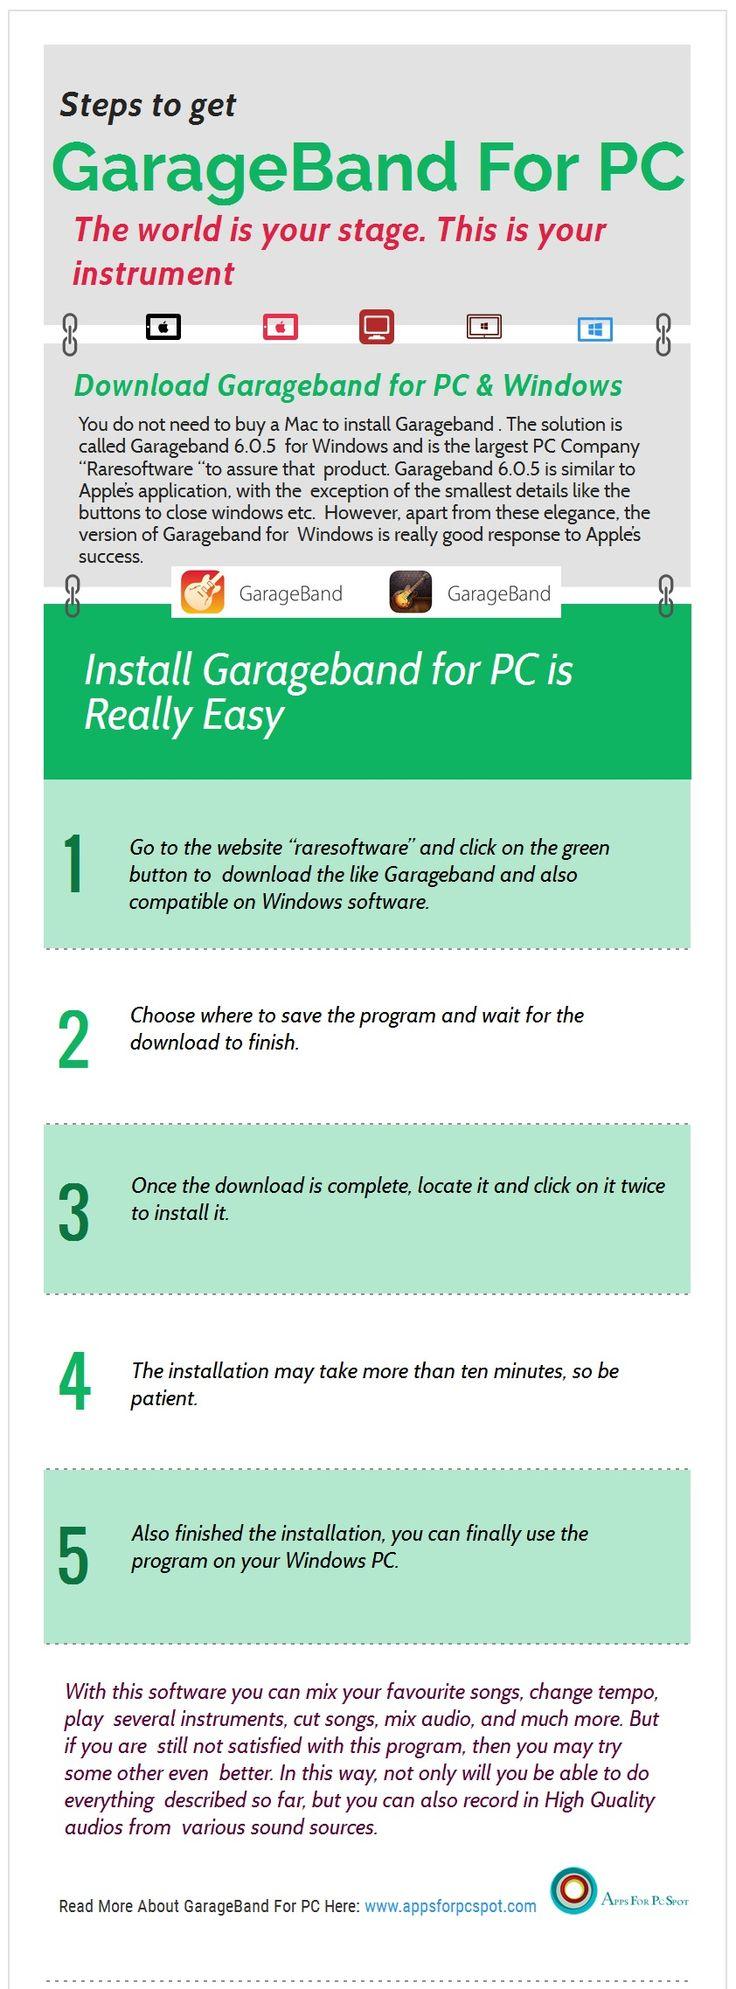 Download GarageBand for PC Windows 7, 8.1, 10 Garage